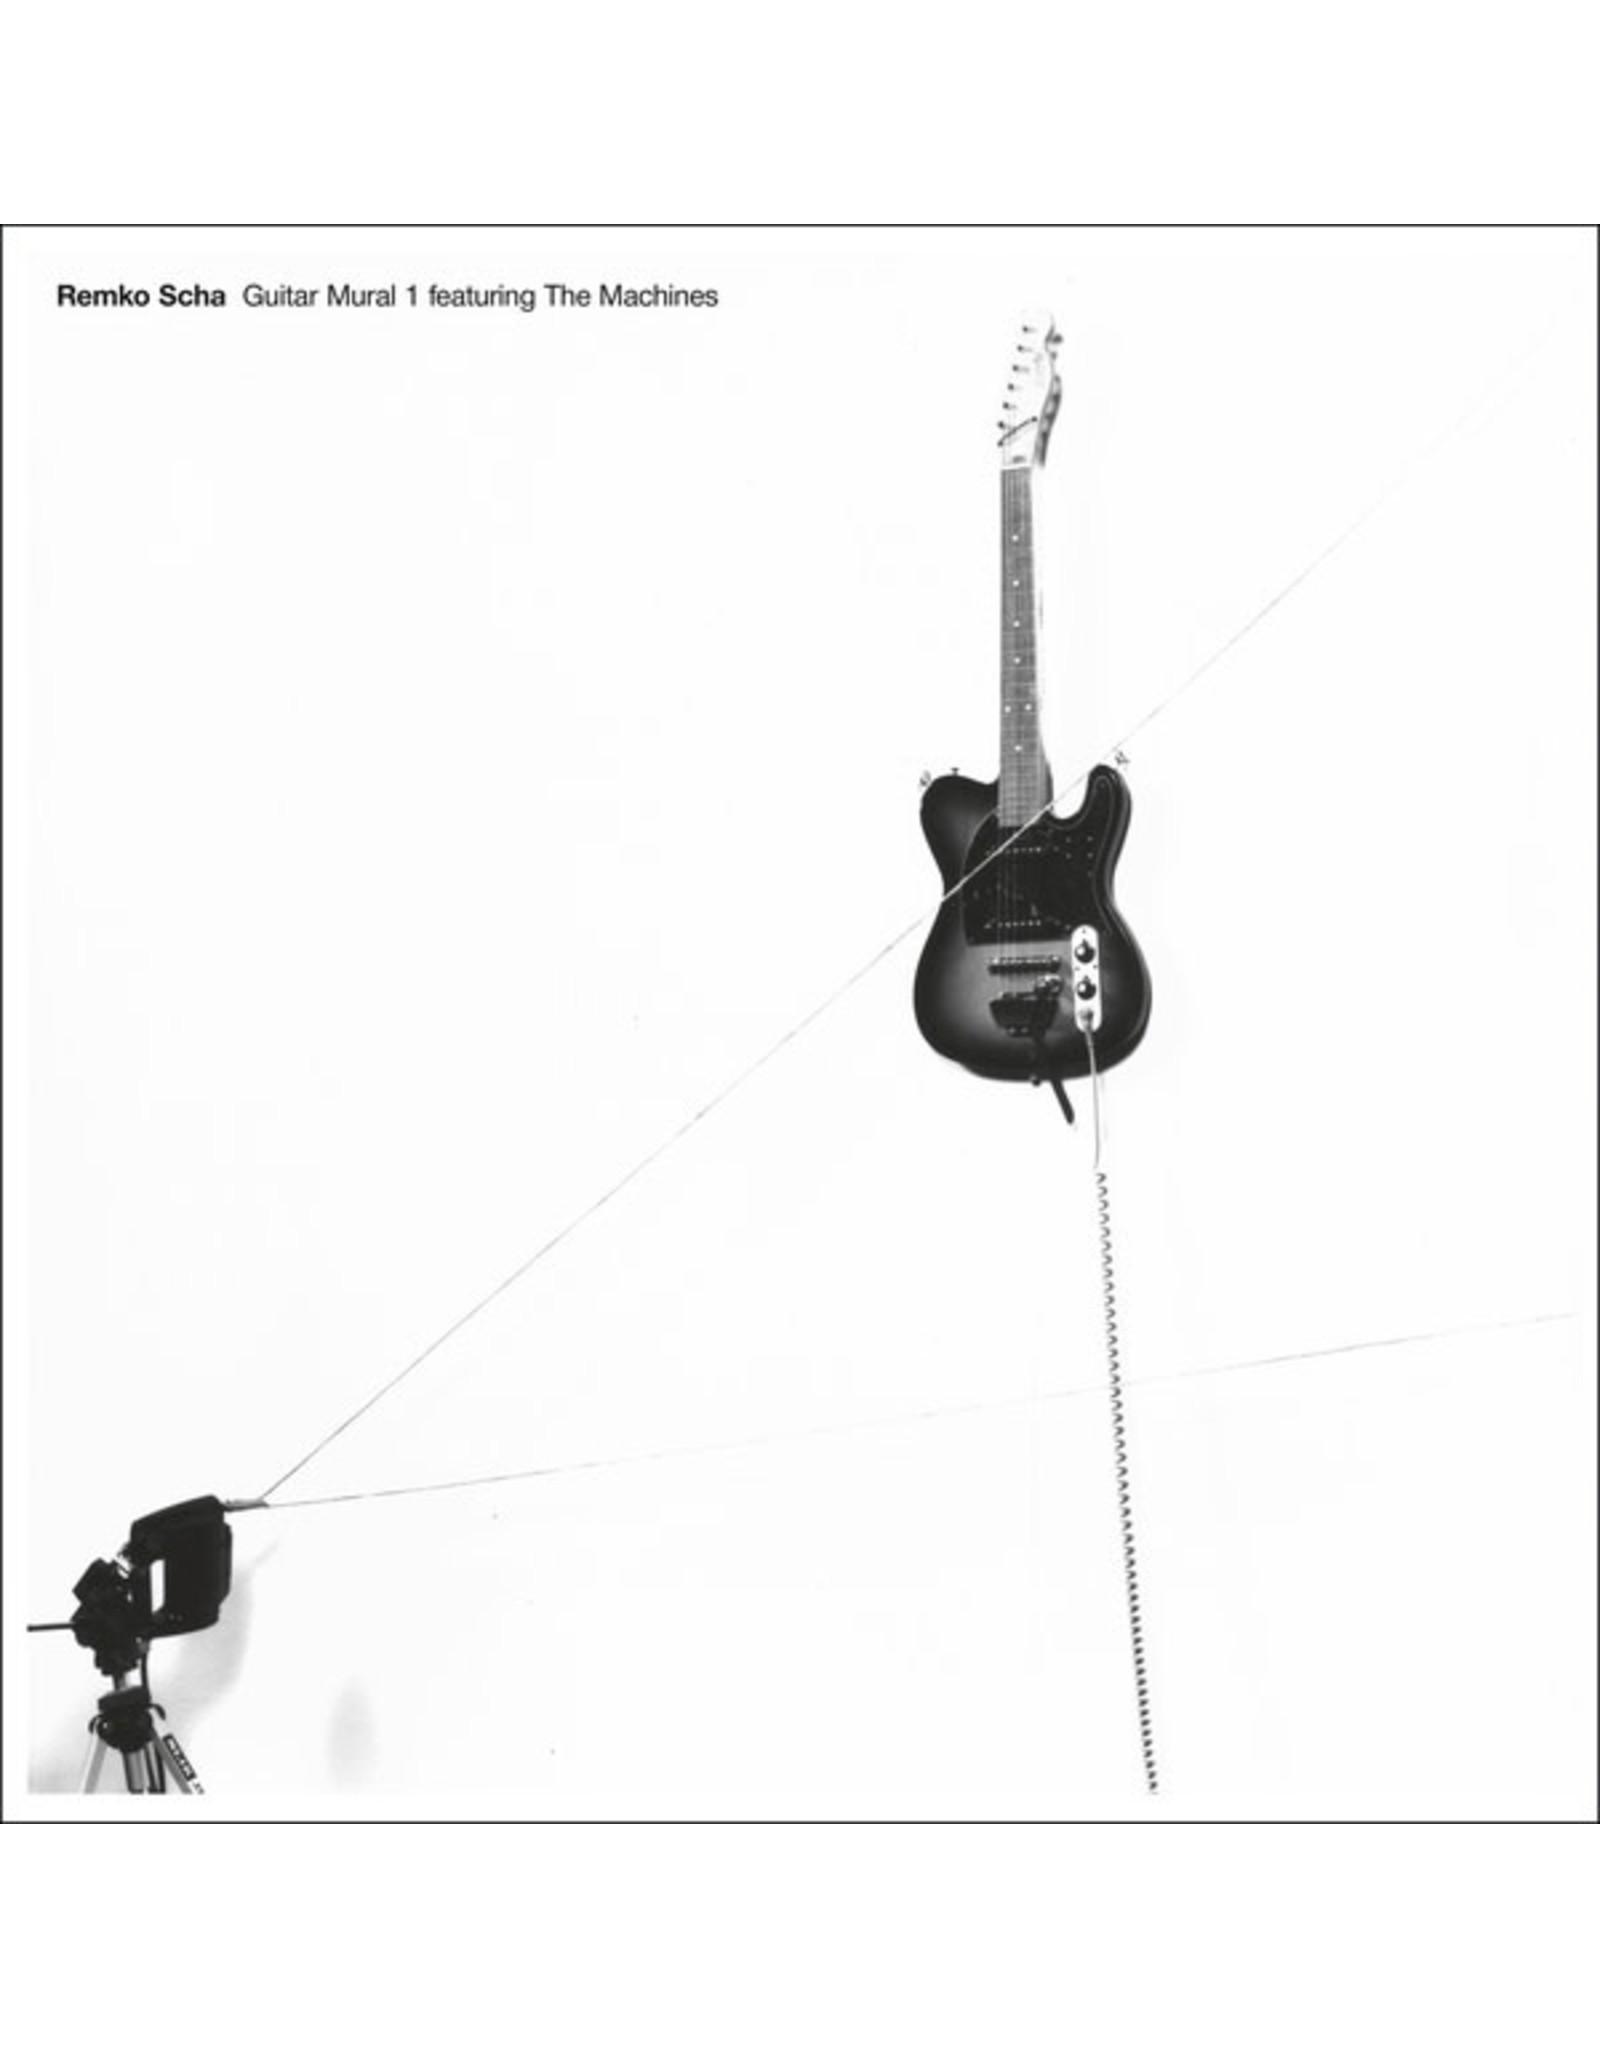 Black Truffle Scha, Remko: Guitar Mural 1 feat. The Machines LP